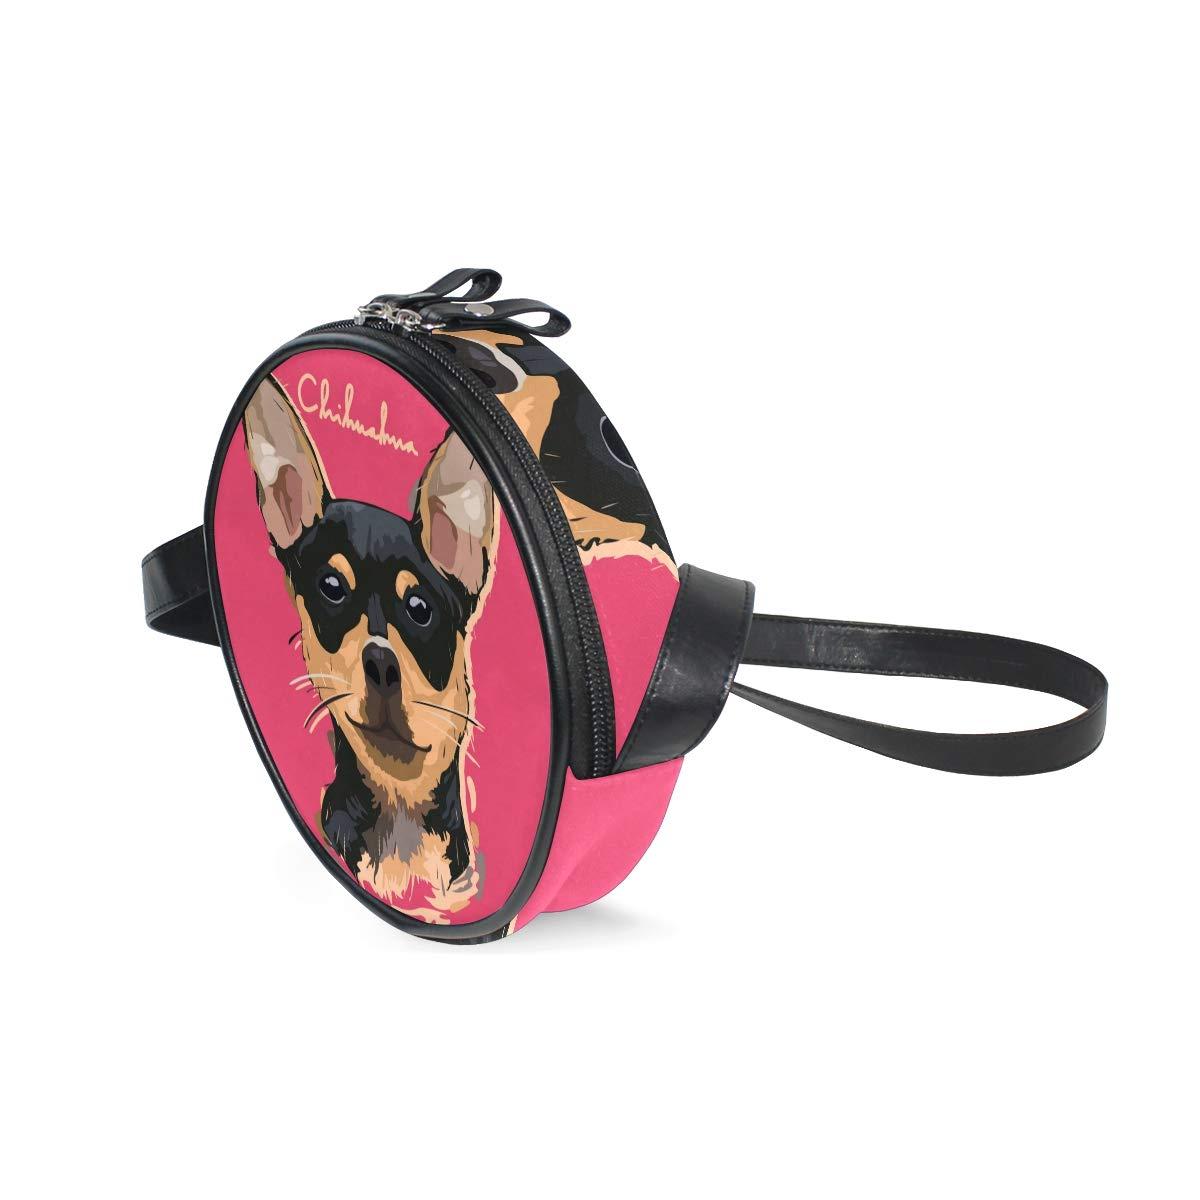 KEAKIA Dachshund Painting Round Crossbody Bag Shoulder Sling Bag Handbag Purse Satchel Shoulder Bag for Kids Women